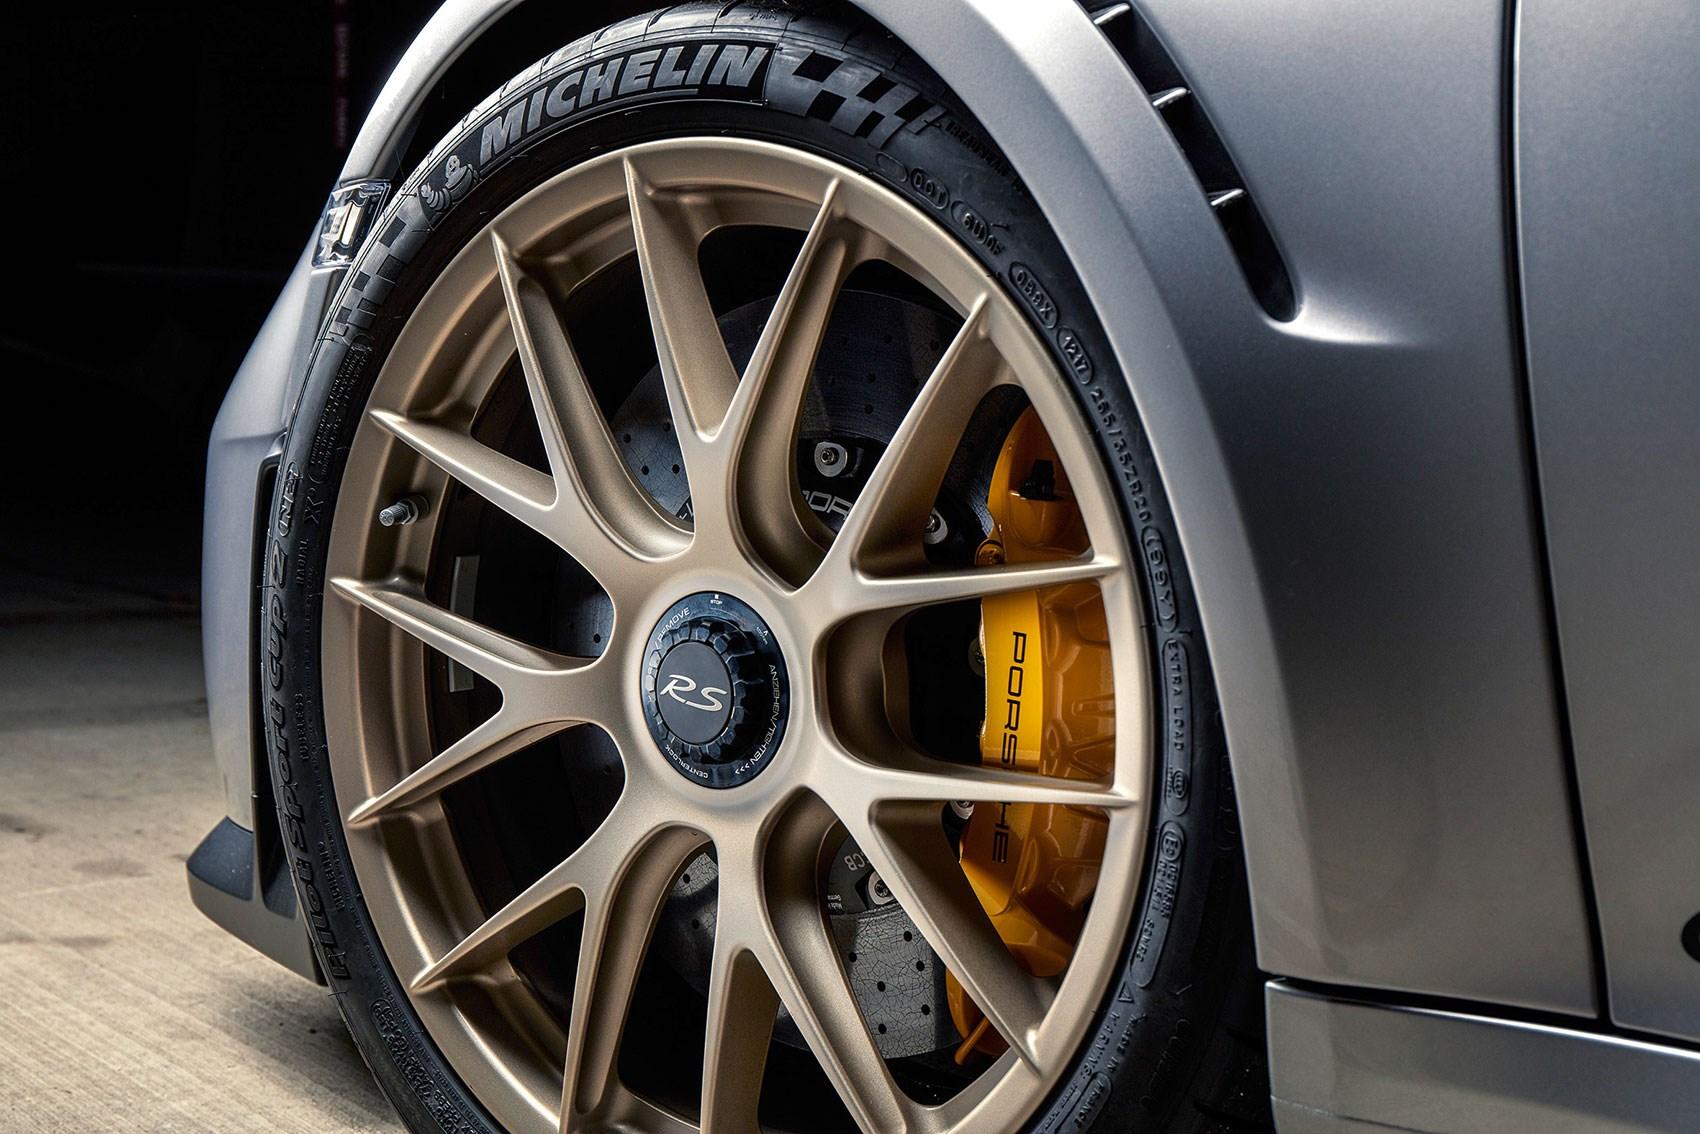 z_911_GT2_RS_alloys Wonderful Porsche 911 Gt2 Rs Review Cars Trend